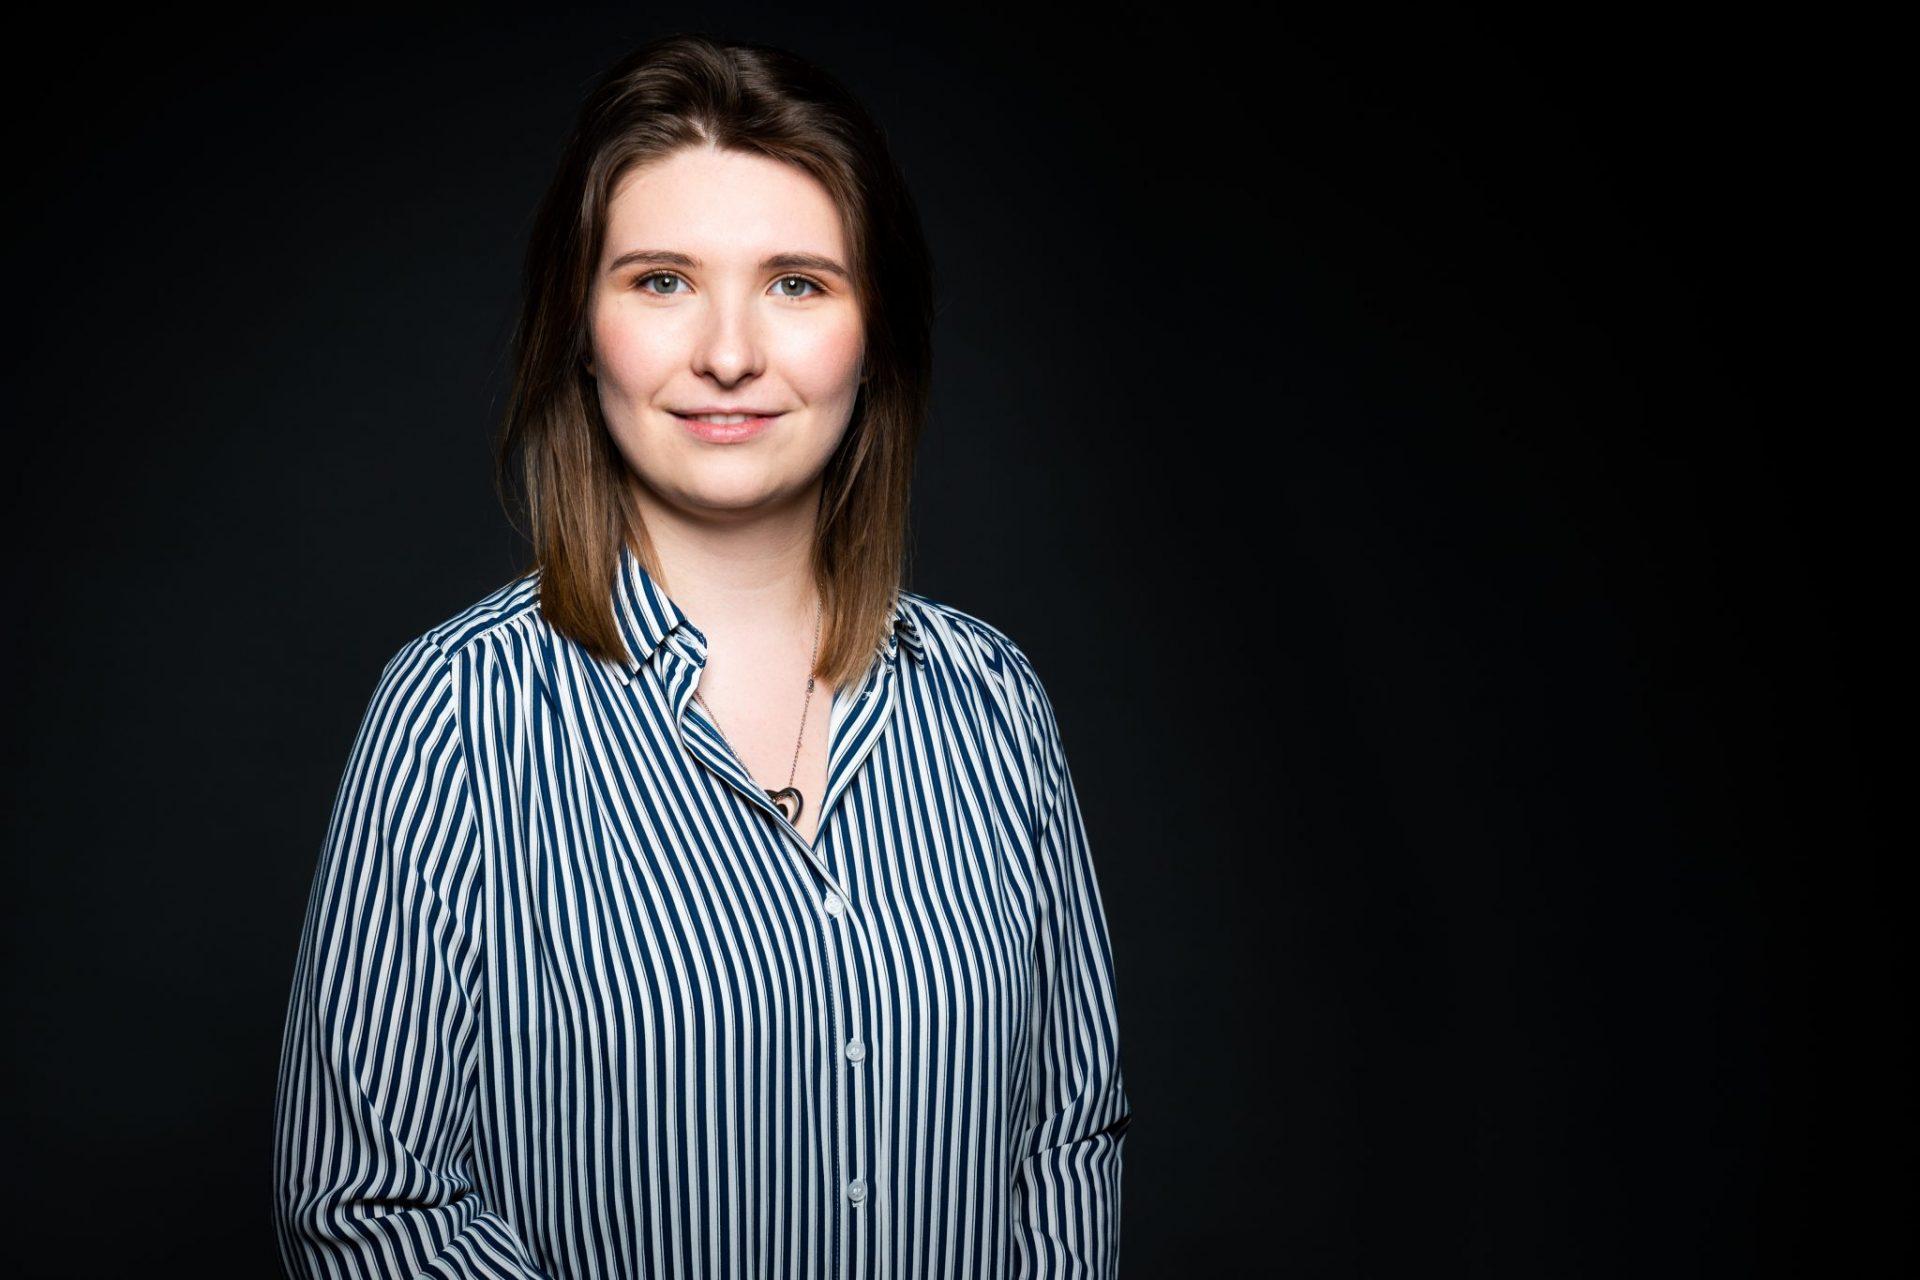 Lisa Holzmüller